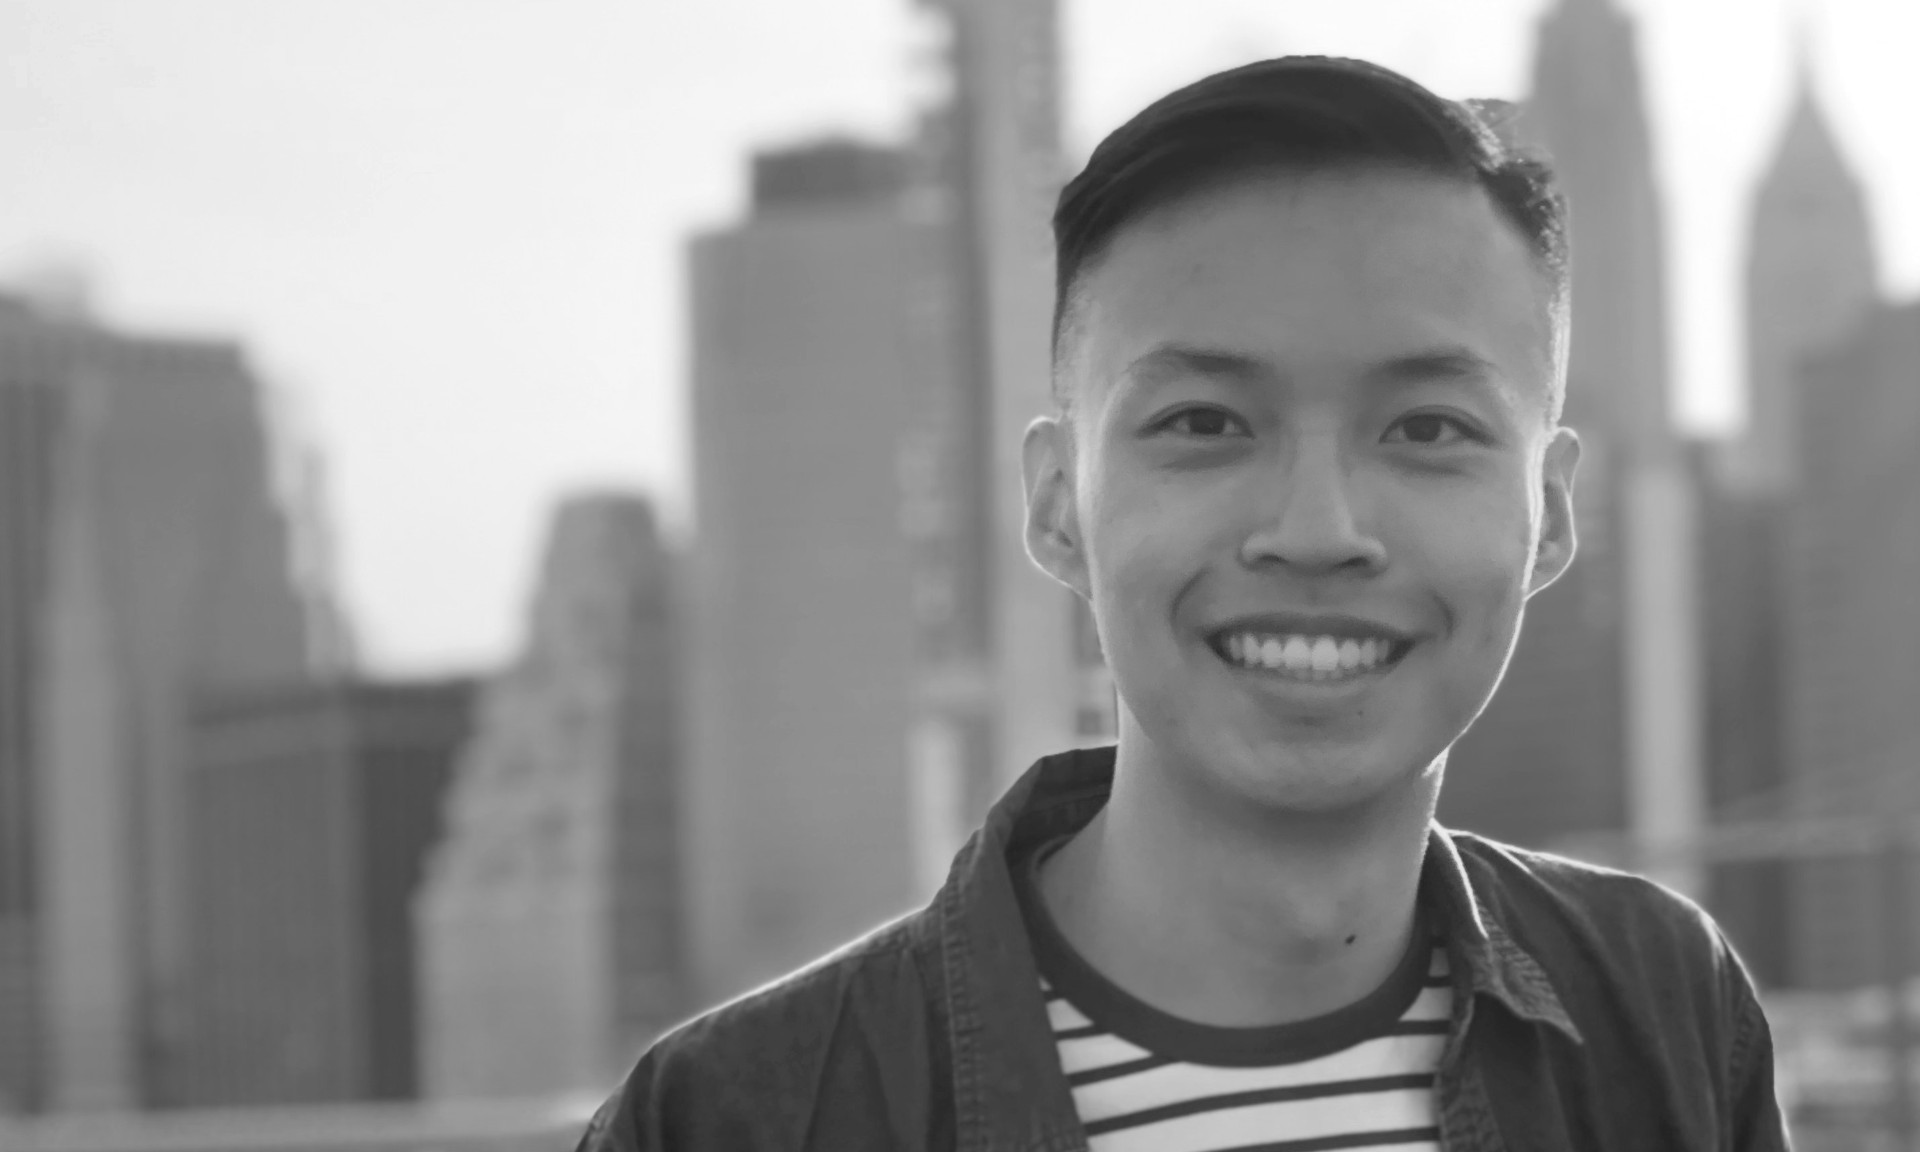 Yung-Hsuan Wu portrait